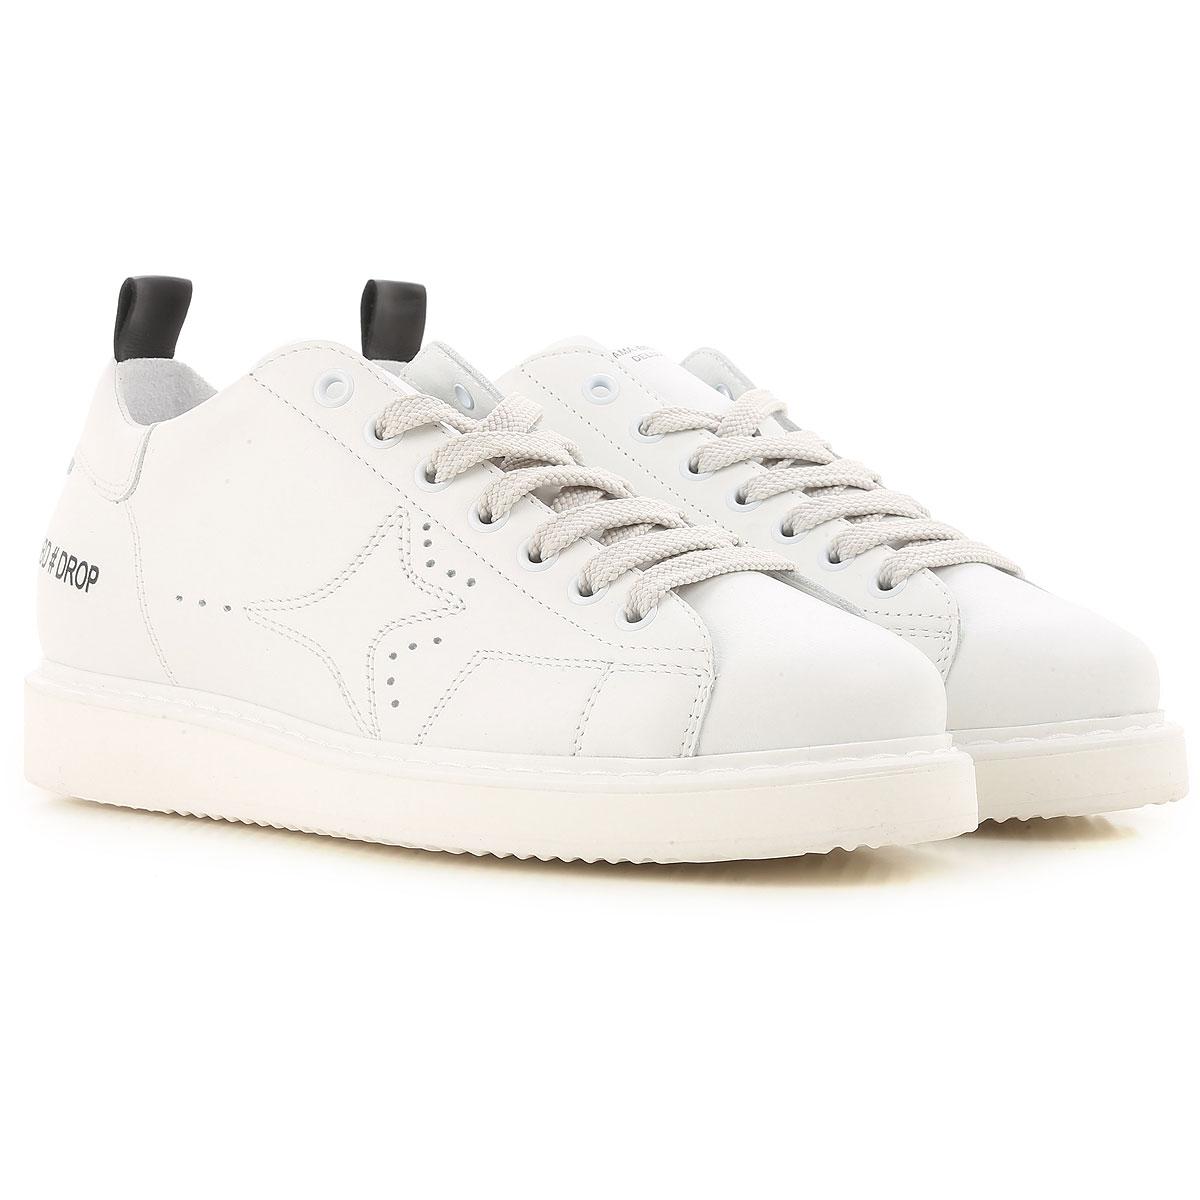 Ama Brand Sneaker Femme, Blanc, Cuir, 2017, 36 37 39 40